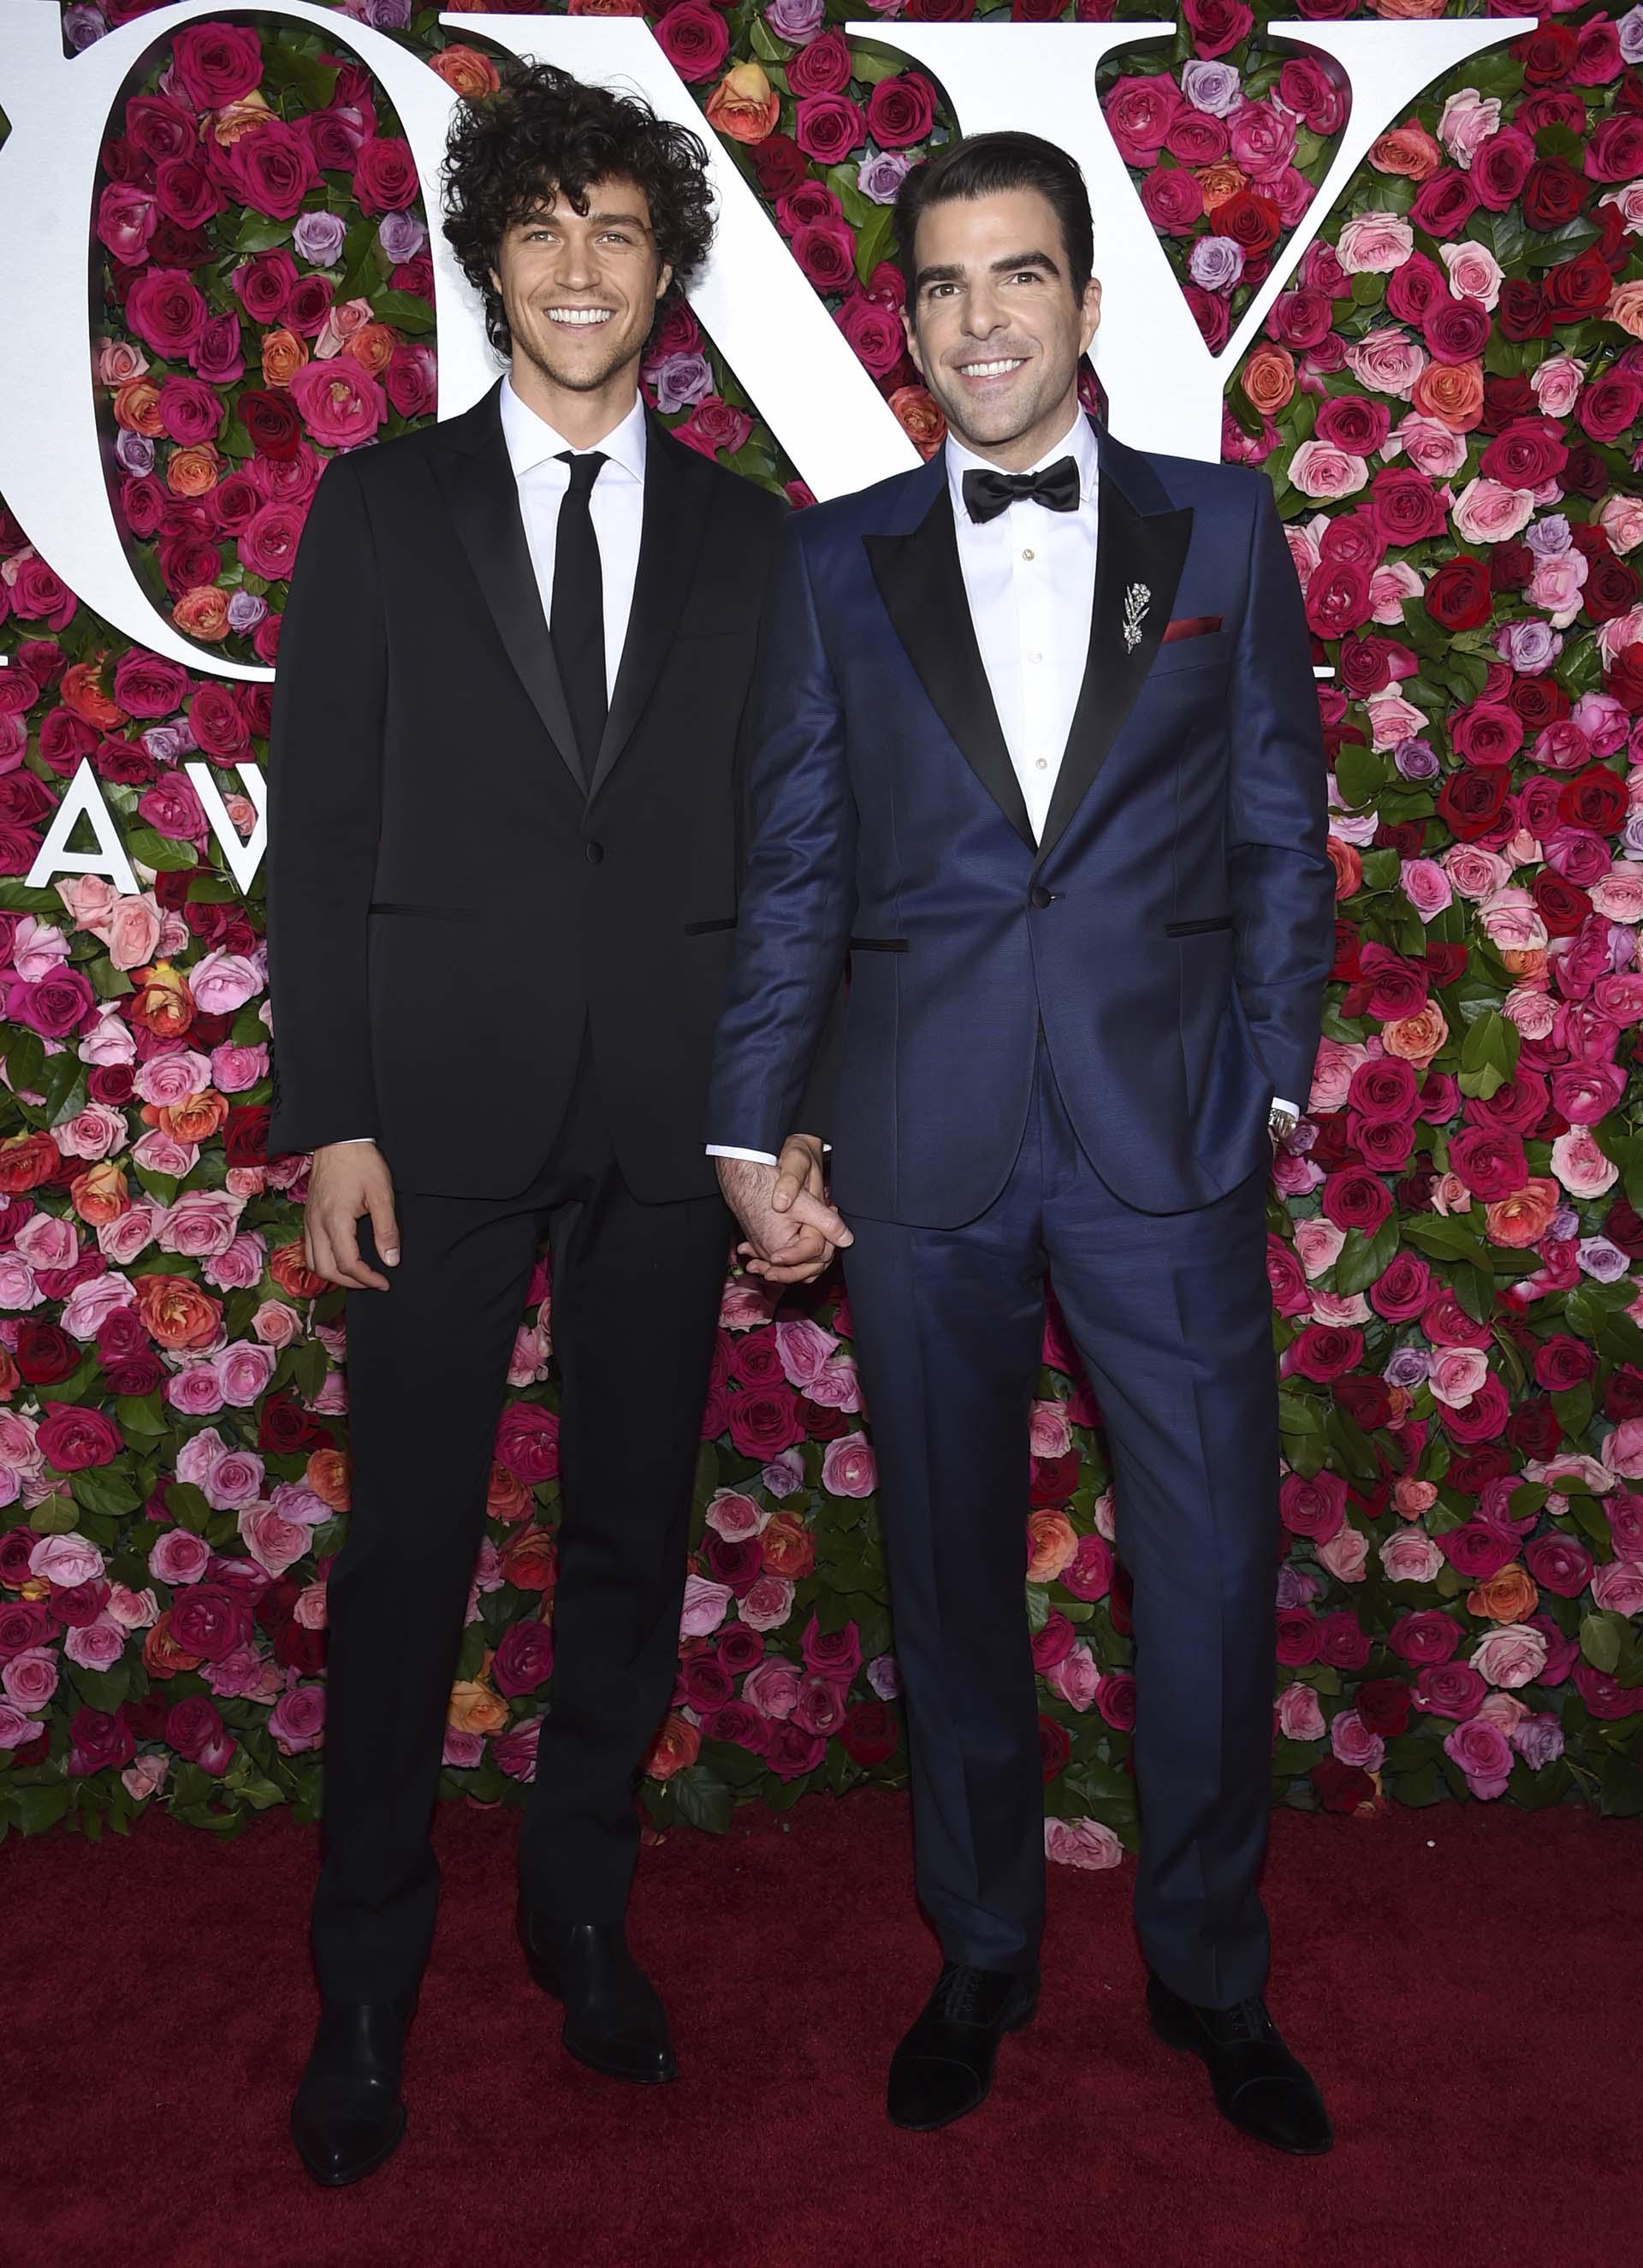 Miles McMillan y Zachary Quinto (Evan Agostini/Invision/AP)